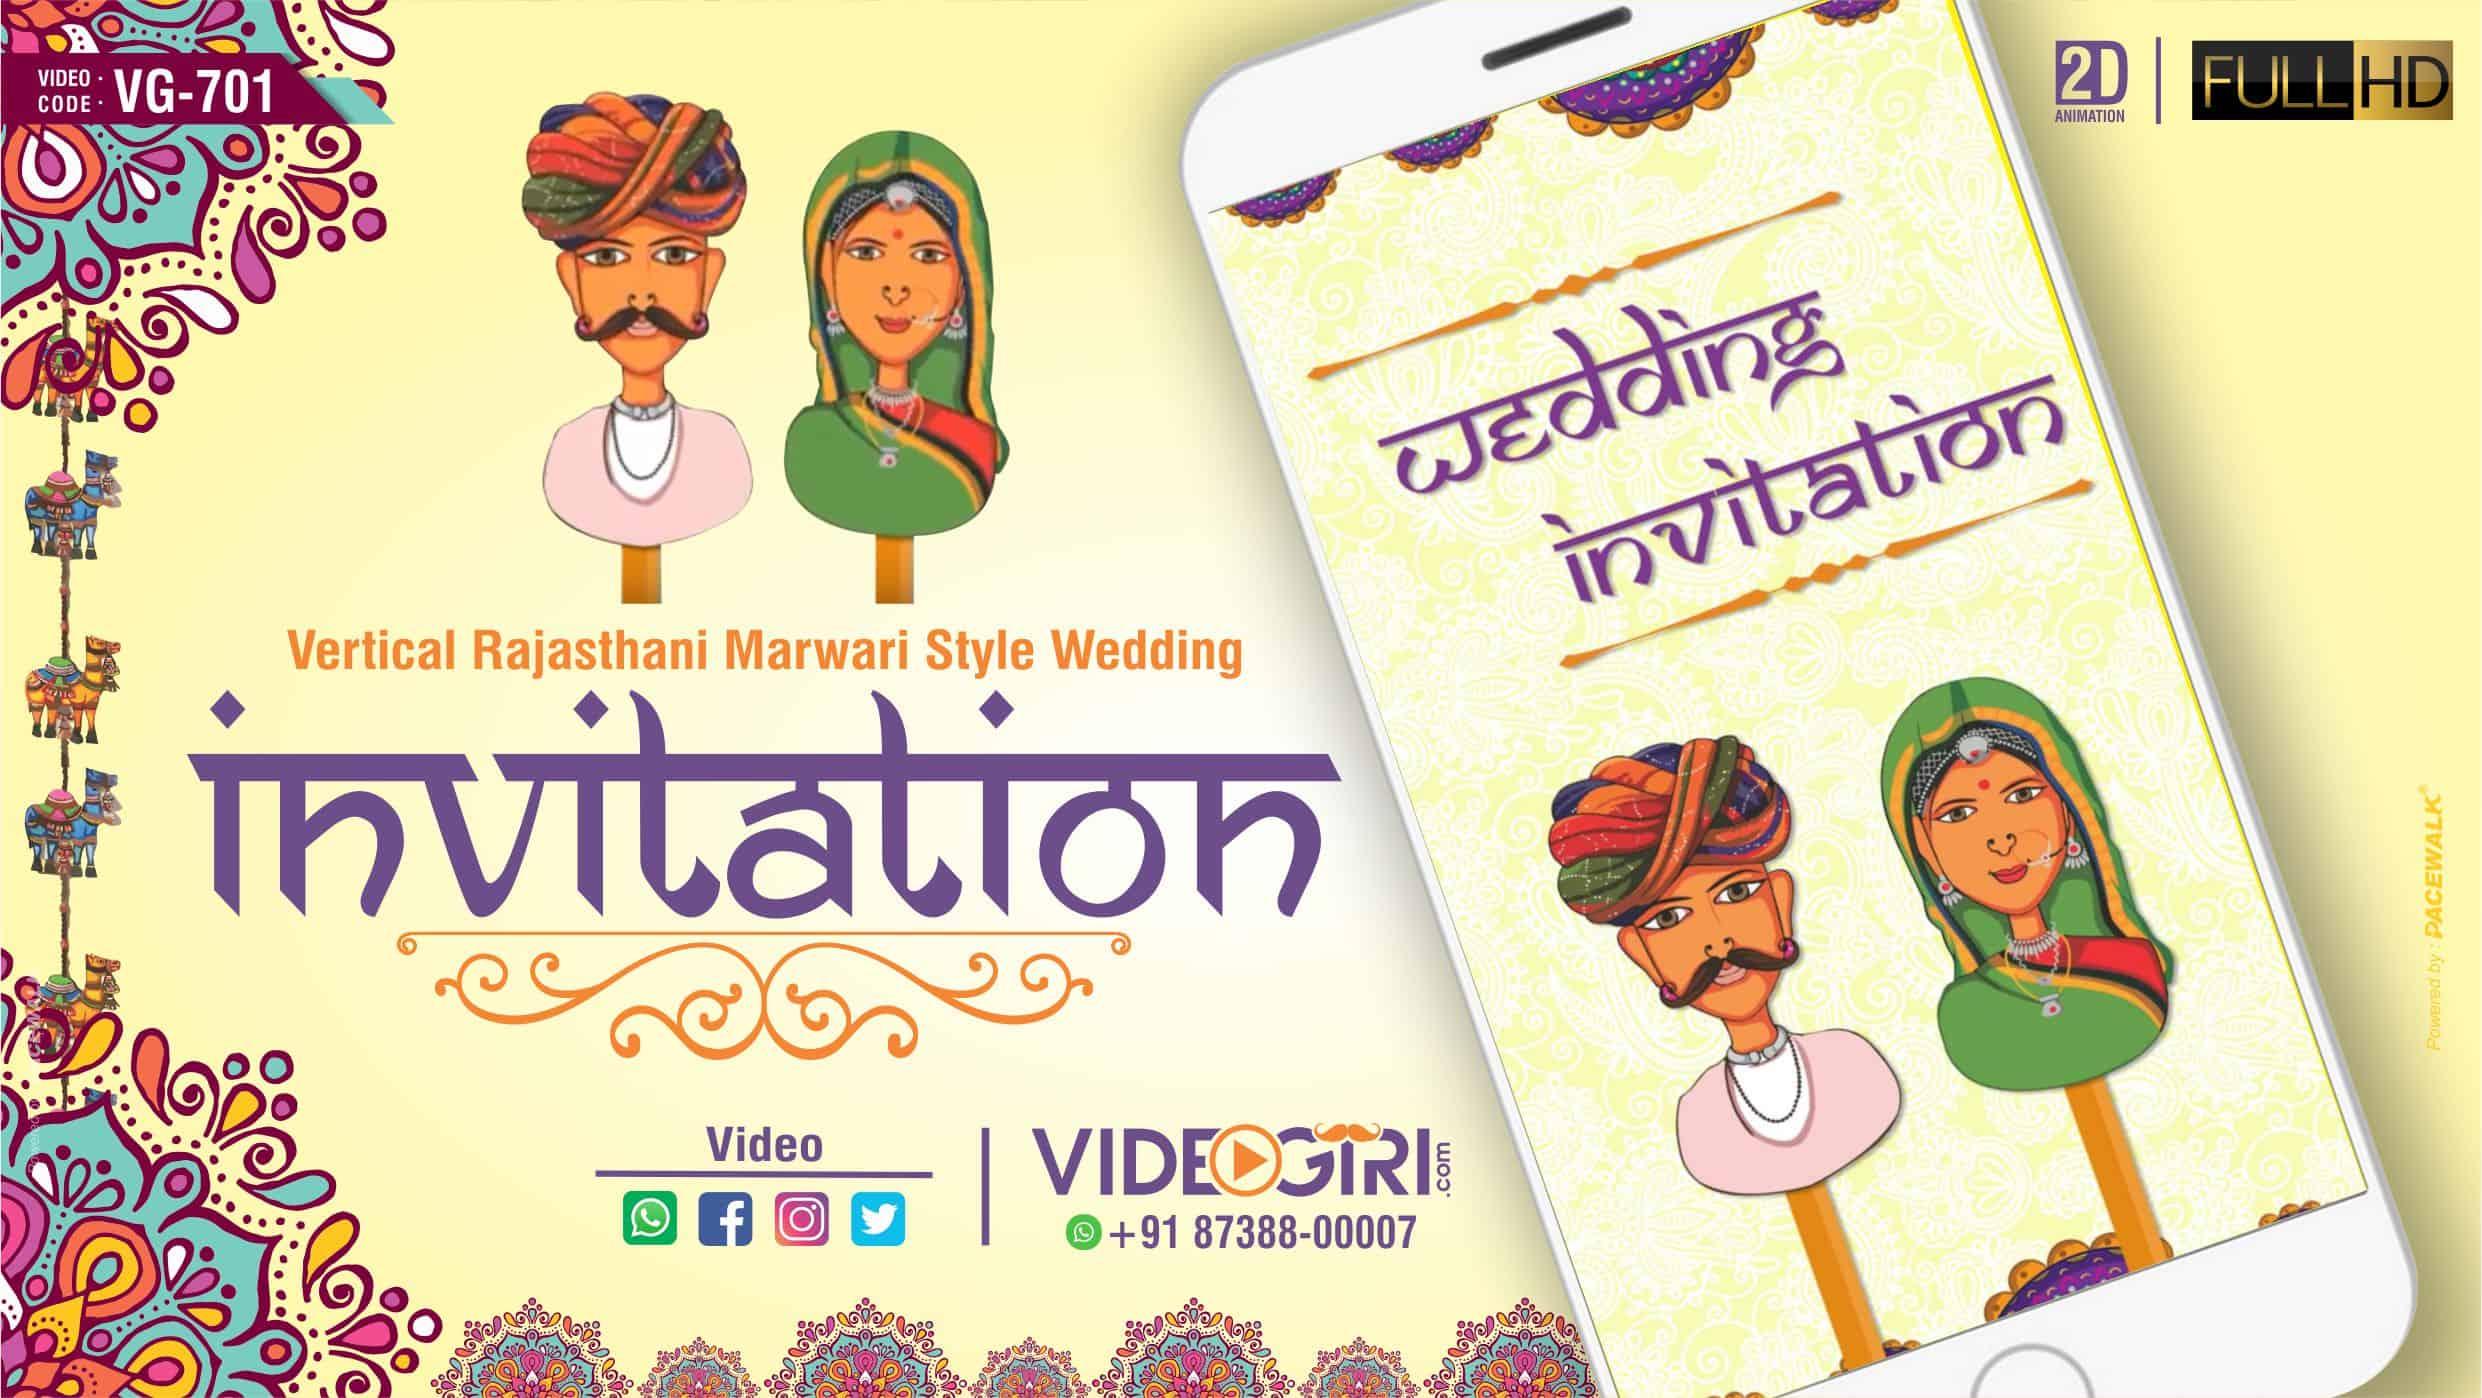 vertical rajasthani marwari style wedding invitation video